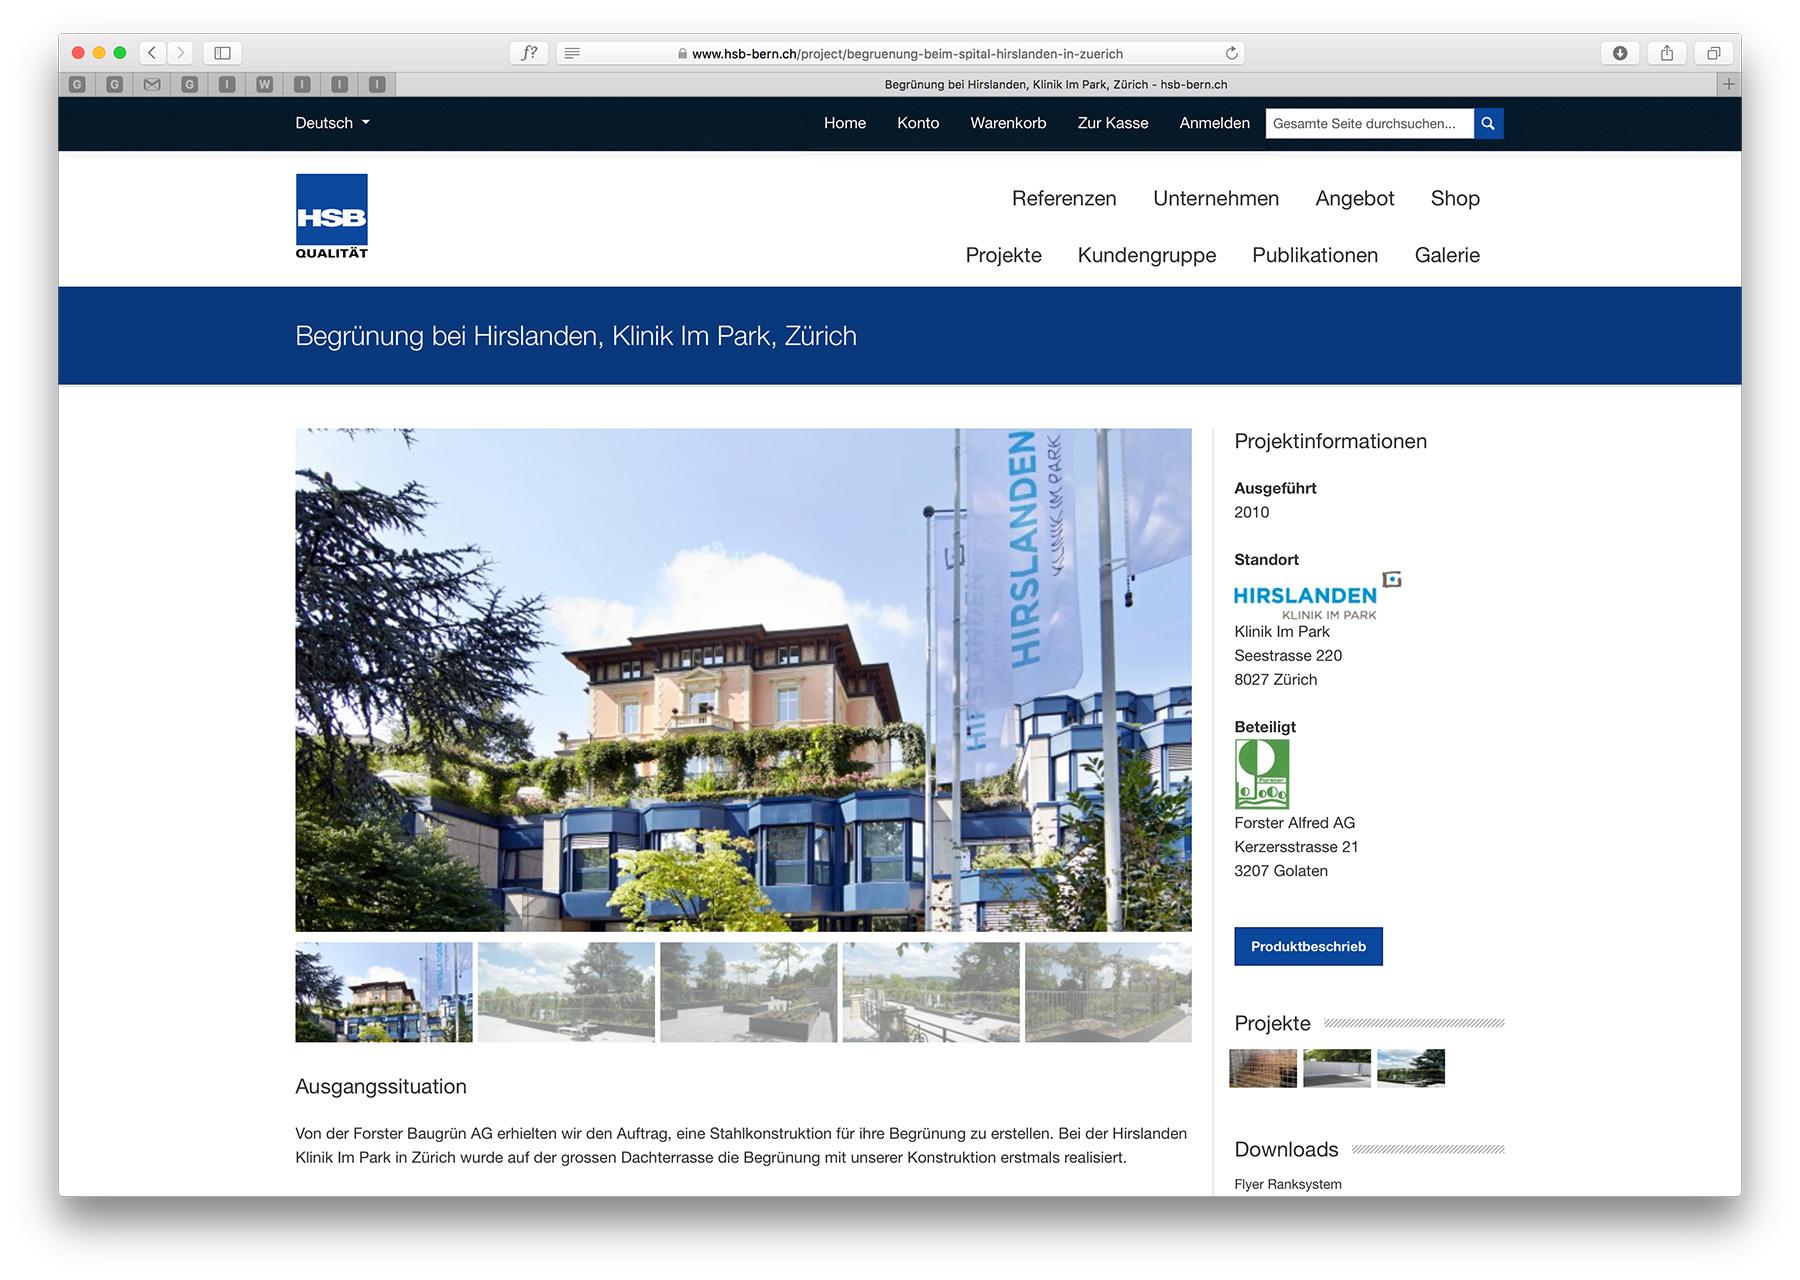 Screenshot aus der E-Commerce-Lösung für die Hans Schmid AG Bern (HSB)